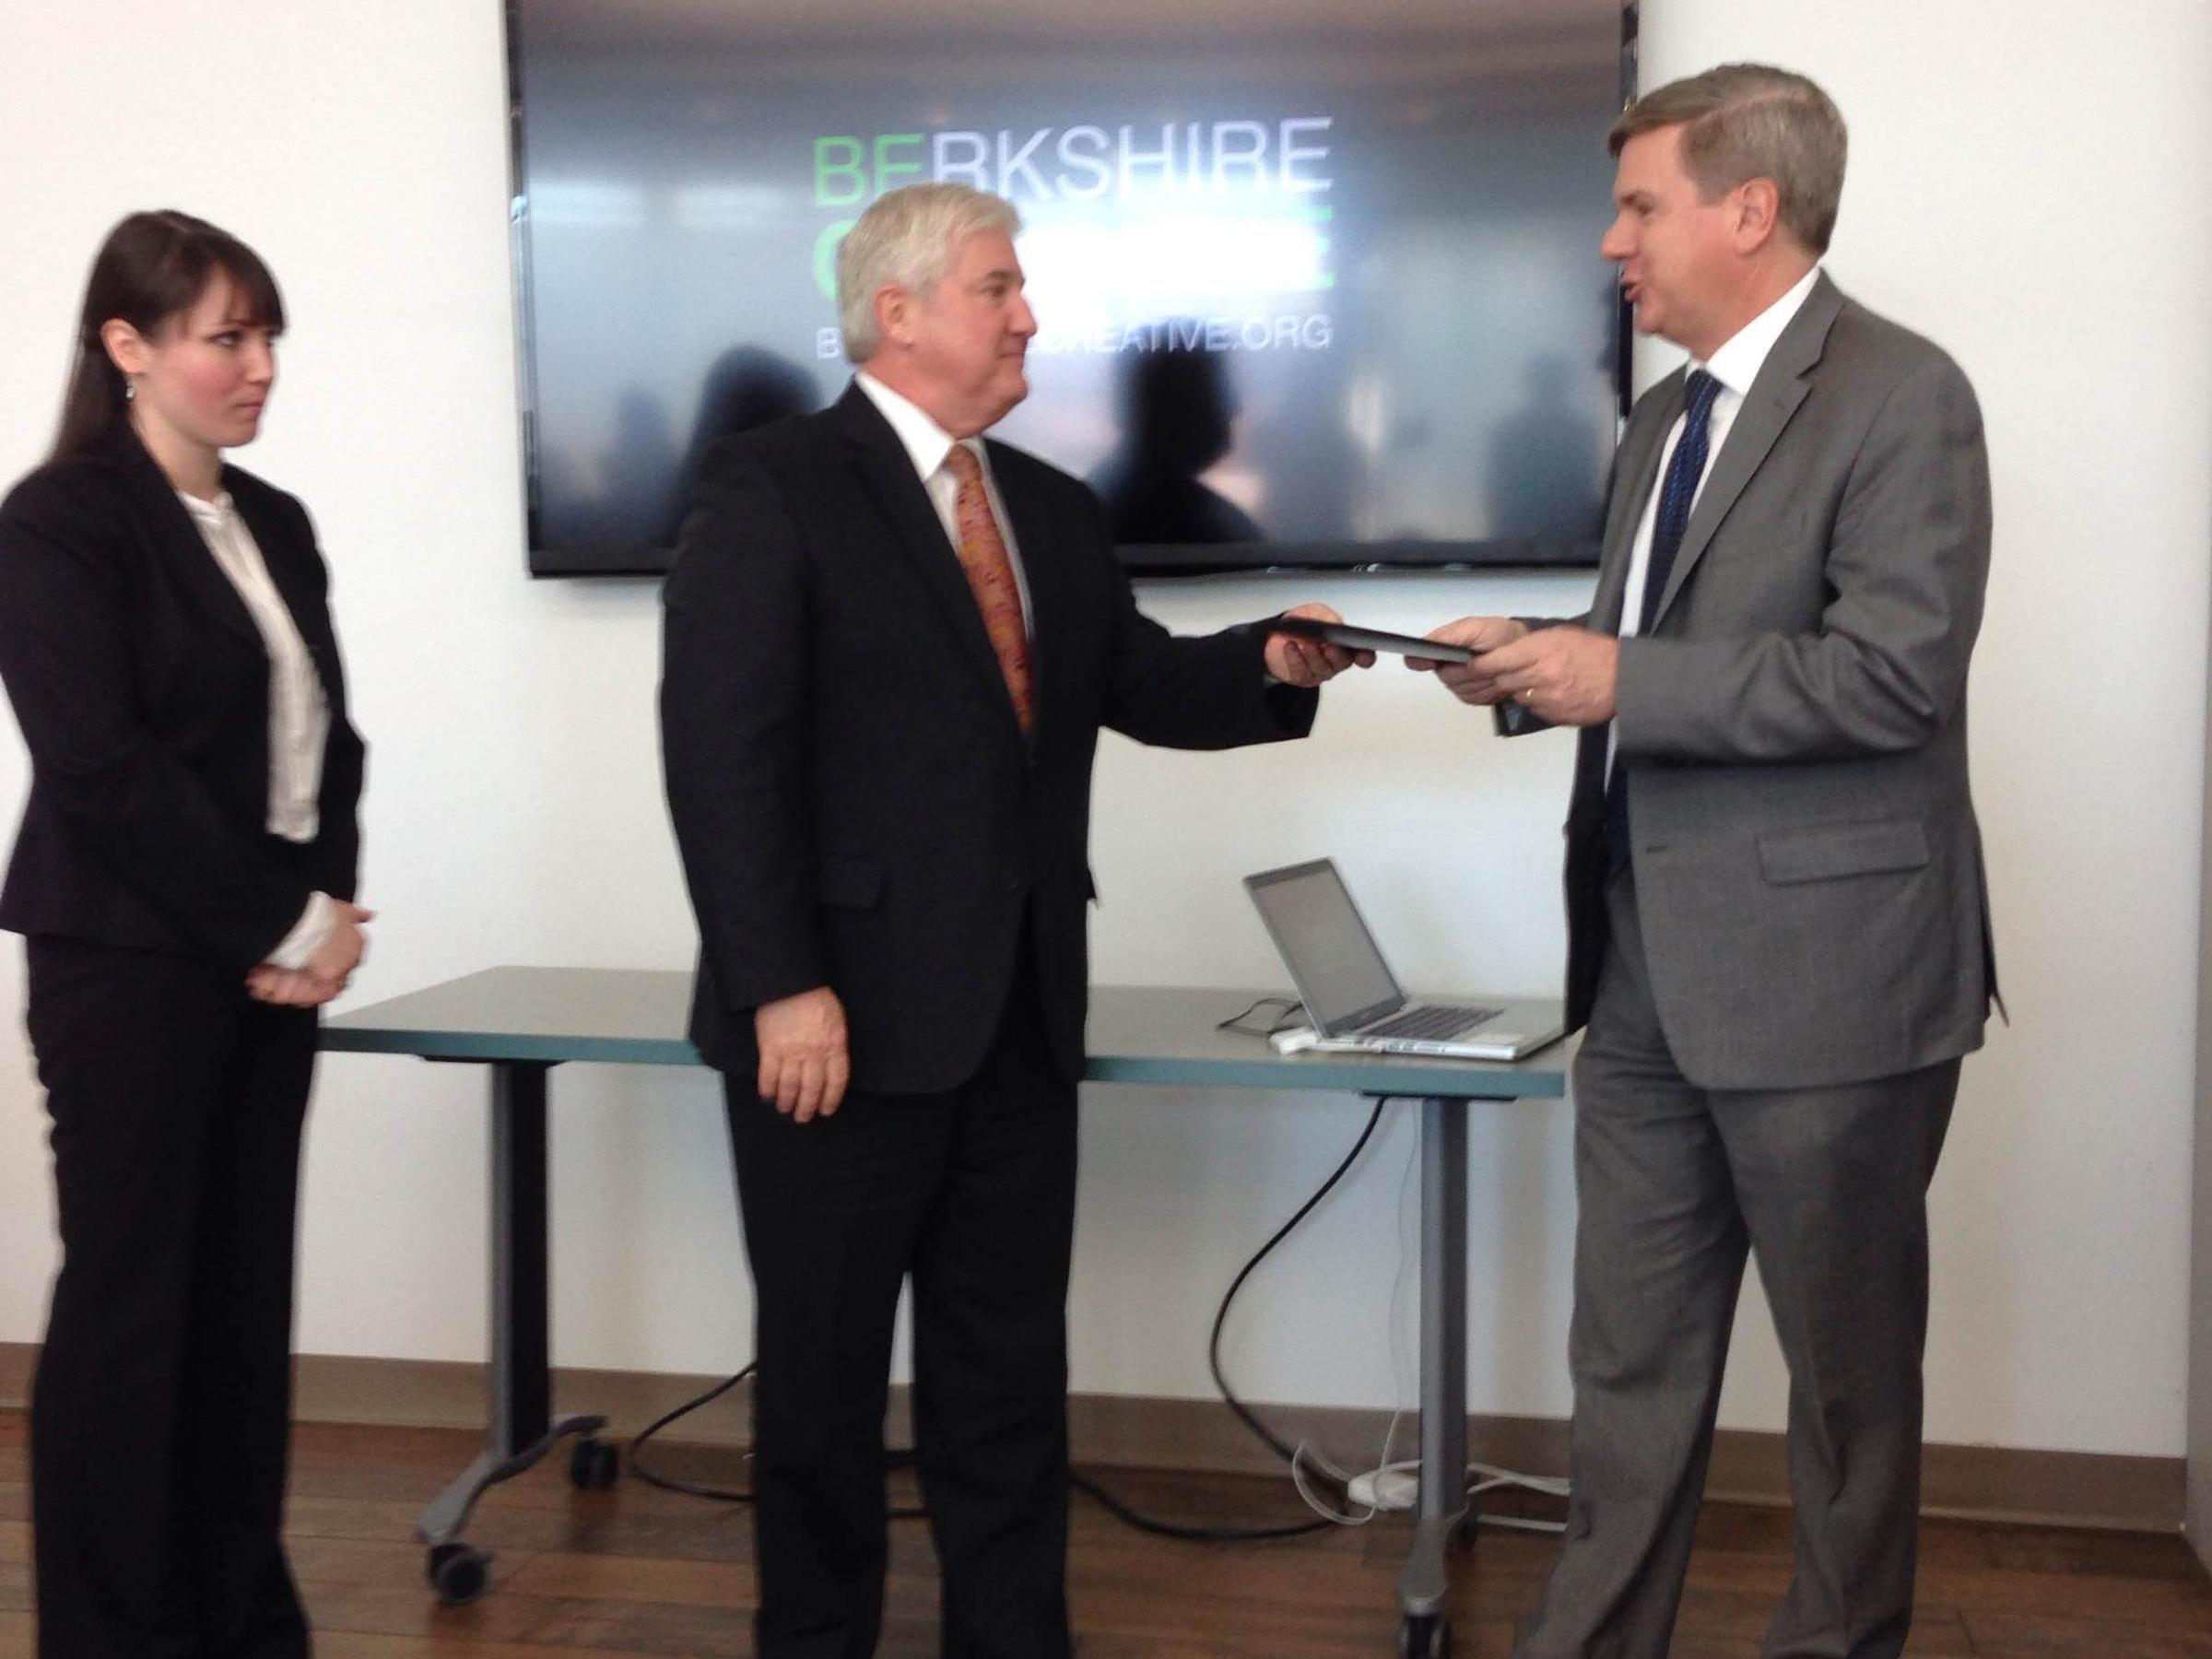 WAMC - MA Taps Berkshire Creative To Lead Region's Innovative Economy